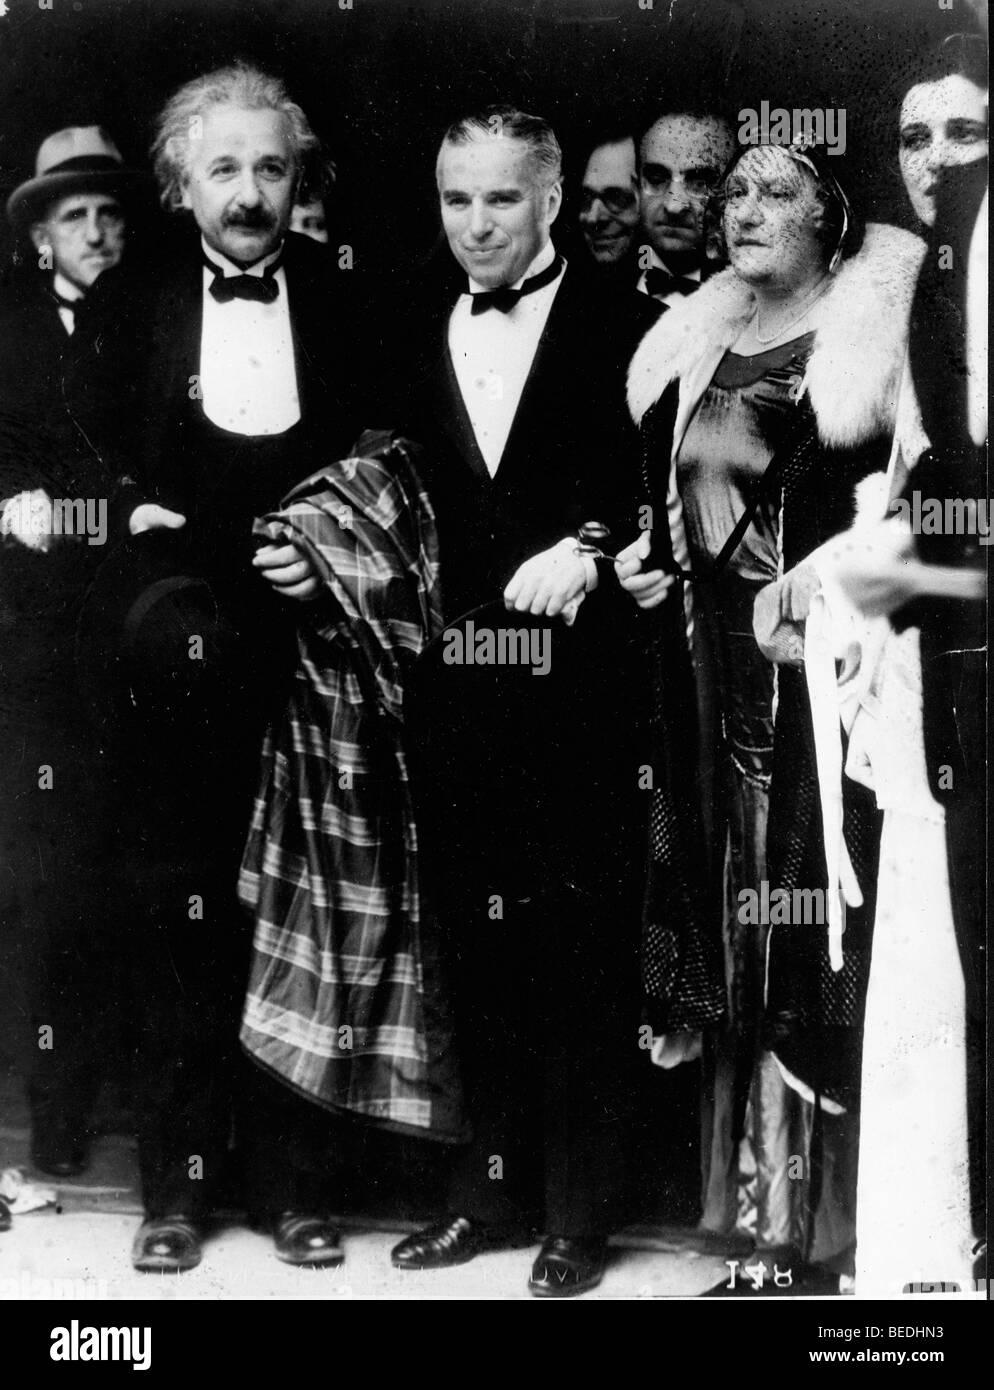 Professor Albert Einstein with his wife Elsa and Charlie Chaplin - Stock Image